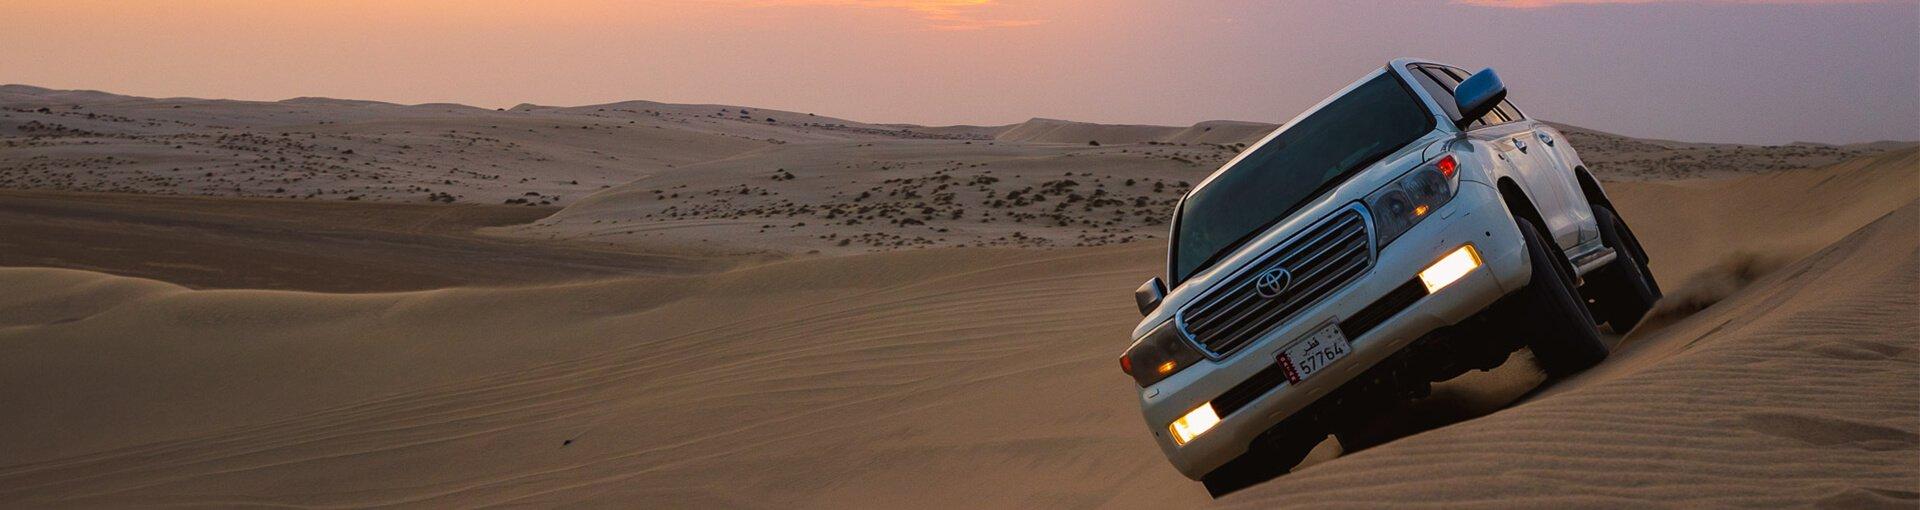 Qatar Desert Safari - Dune Bashing Tour